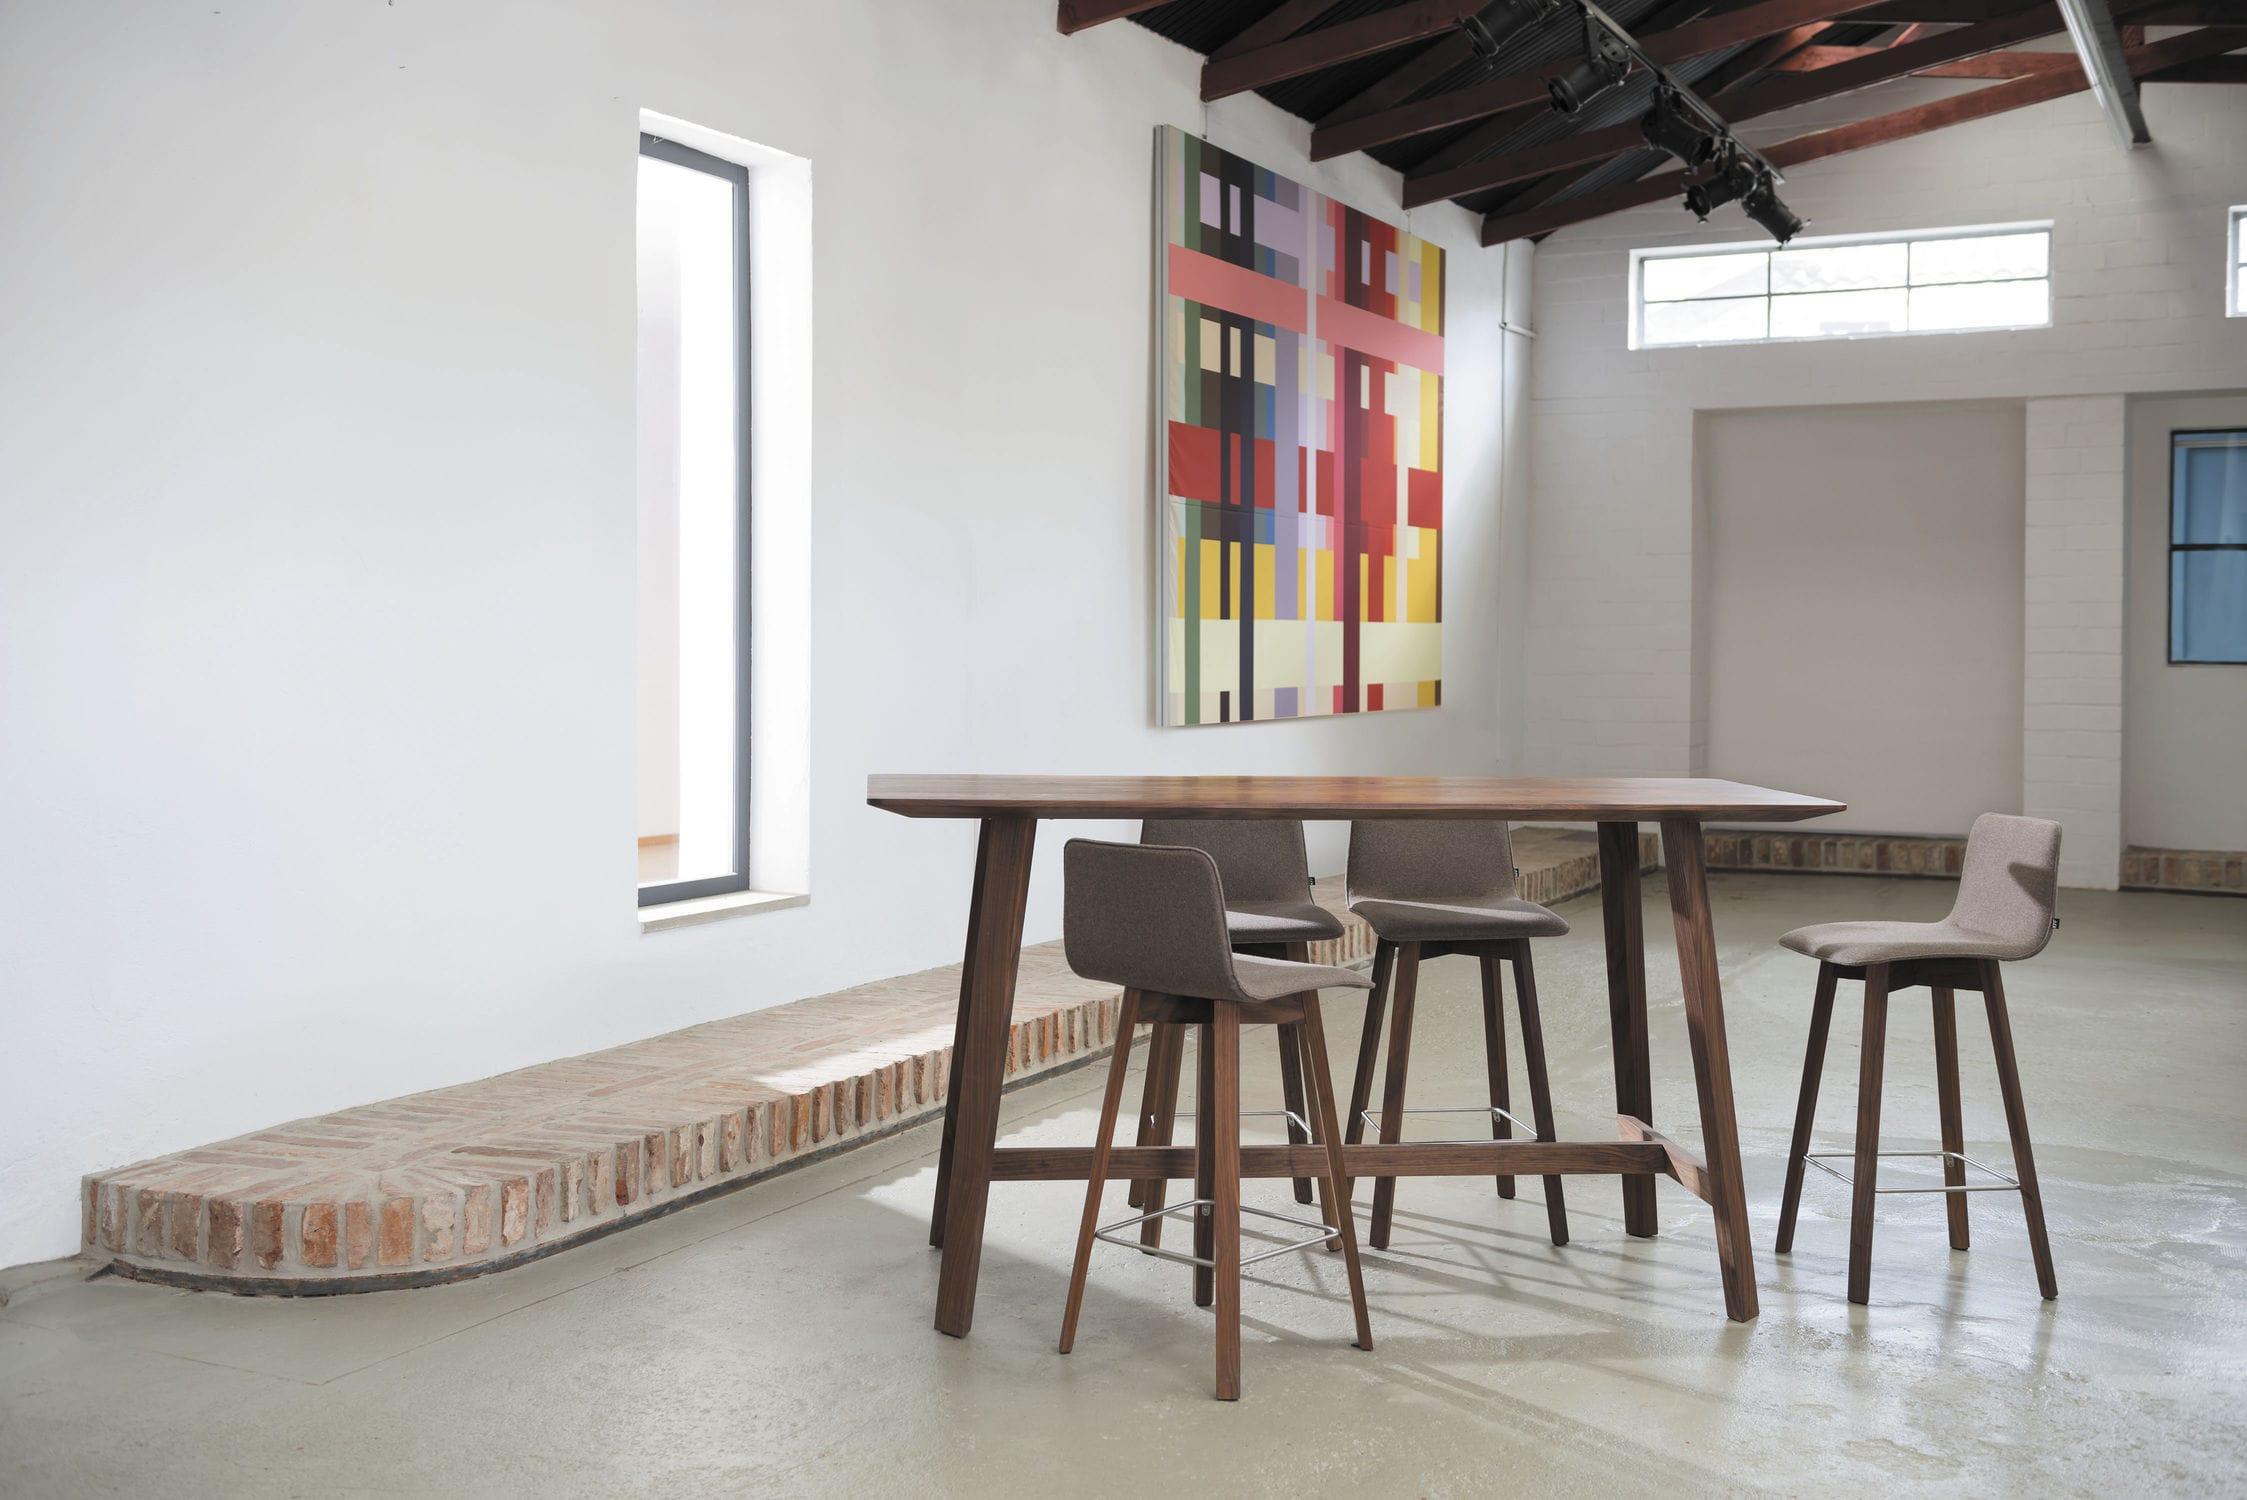 Tavolo Alto Cucina: Voffca.com mattonelle rivestimento cucina ...